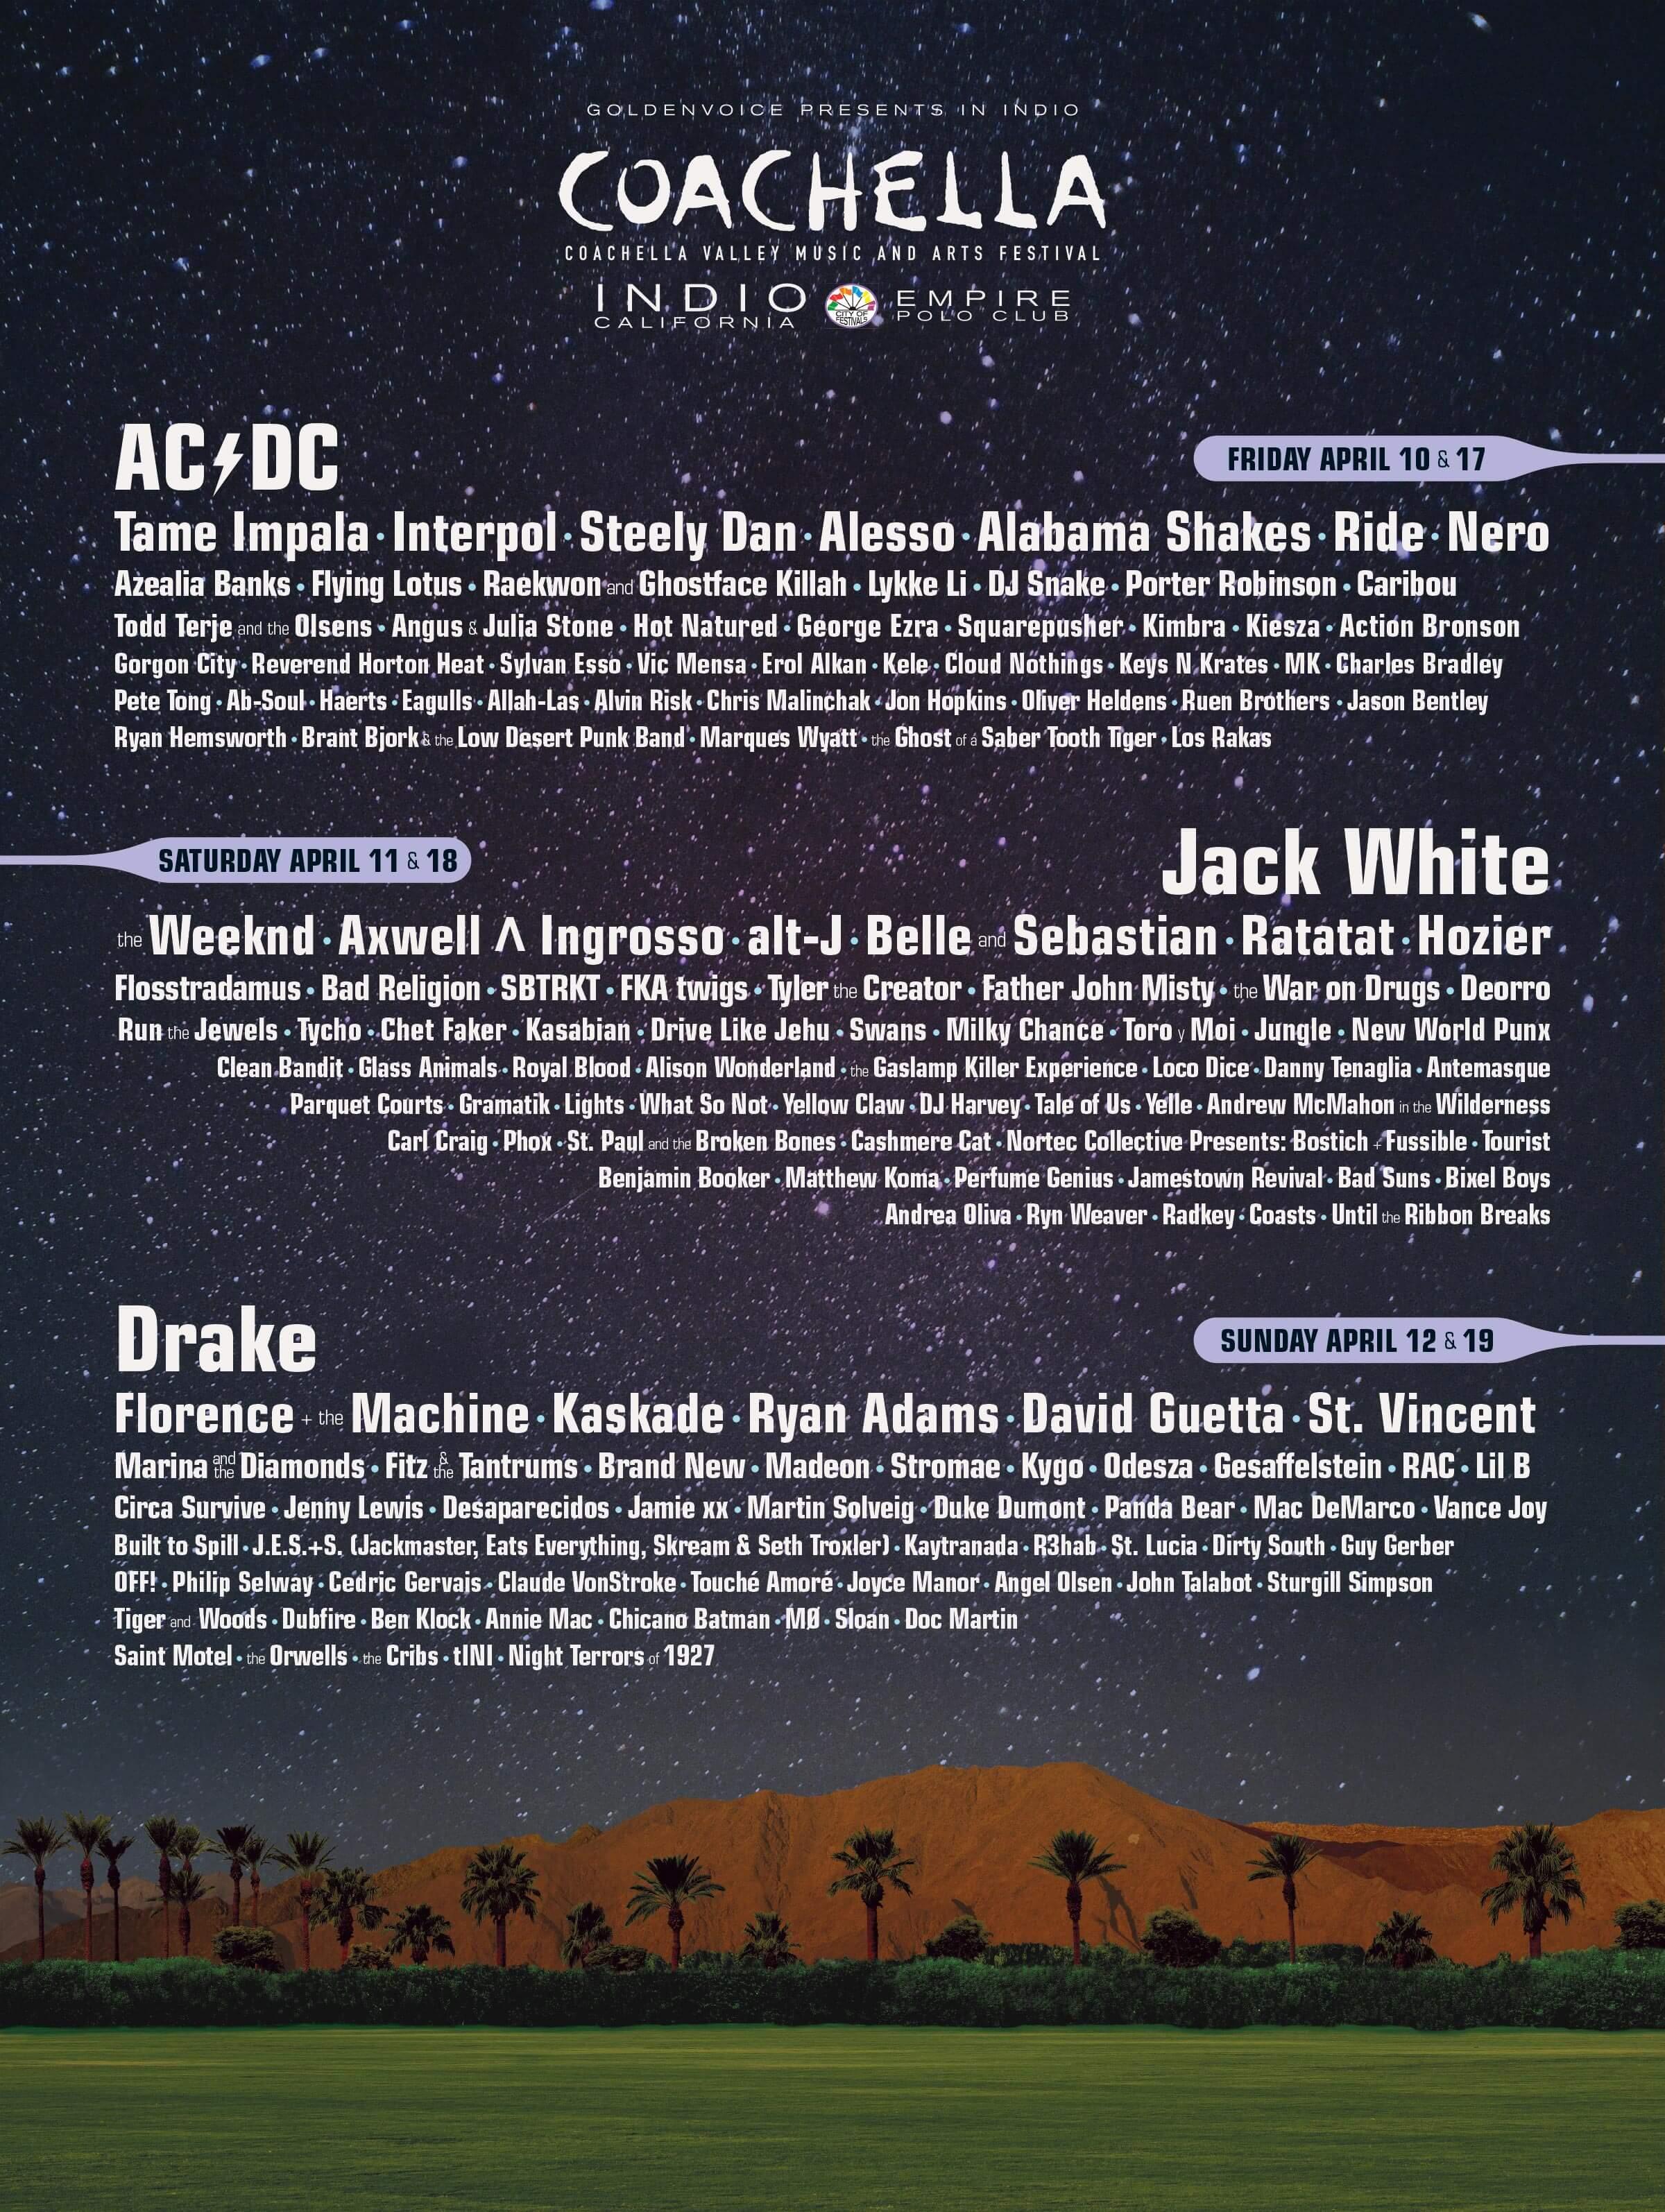 Coachella 2015 Lineup Poster